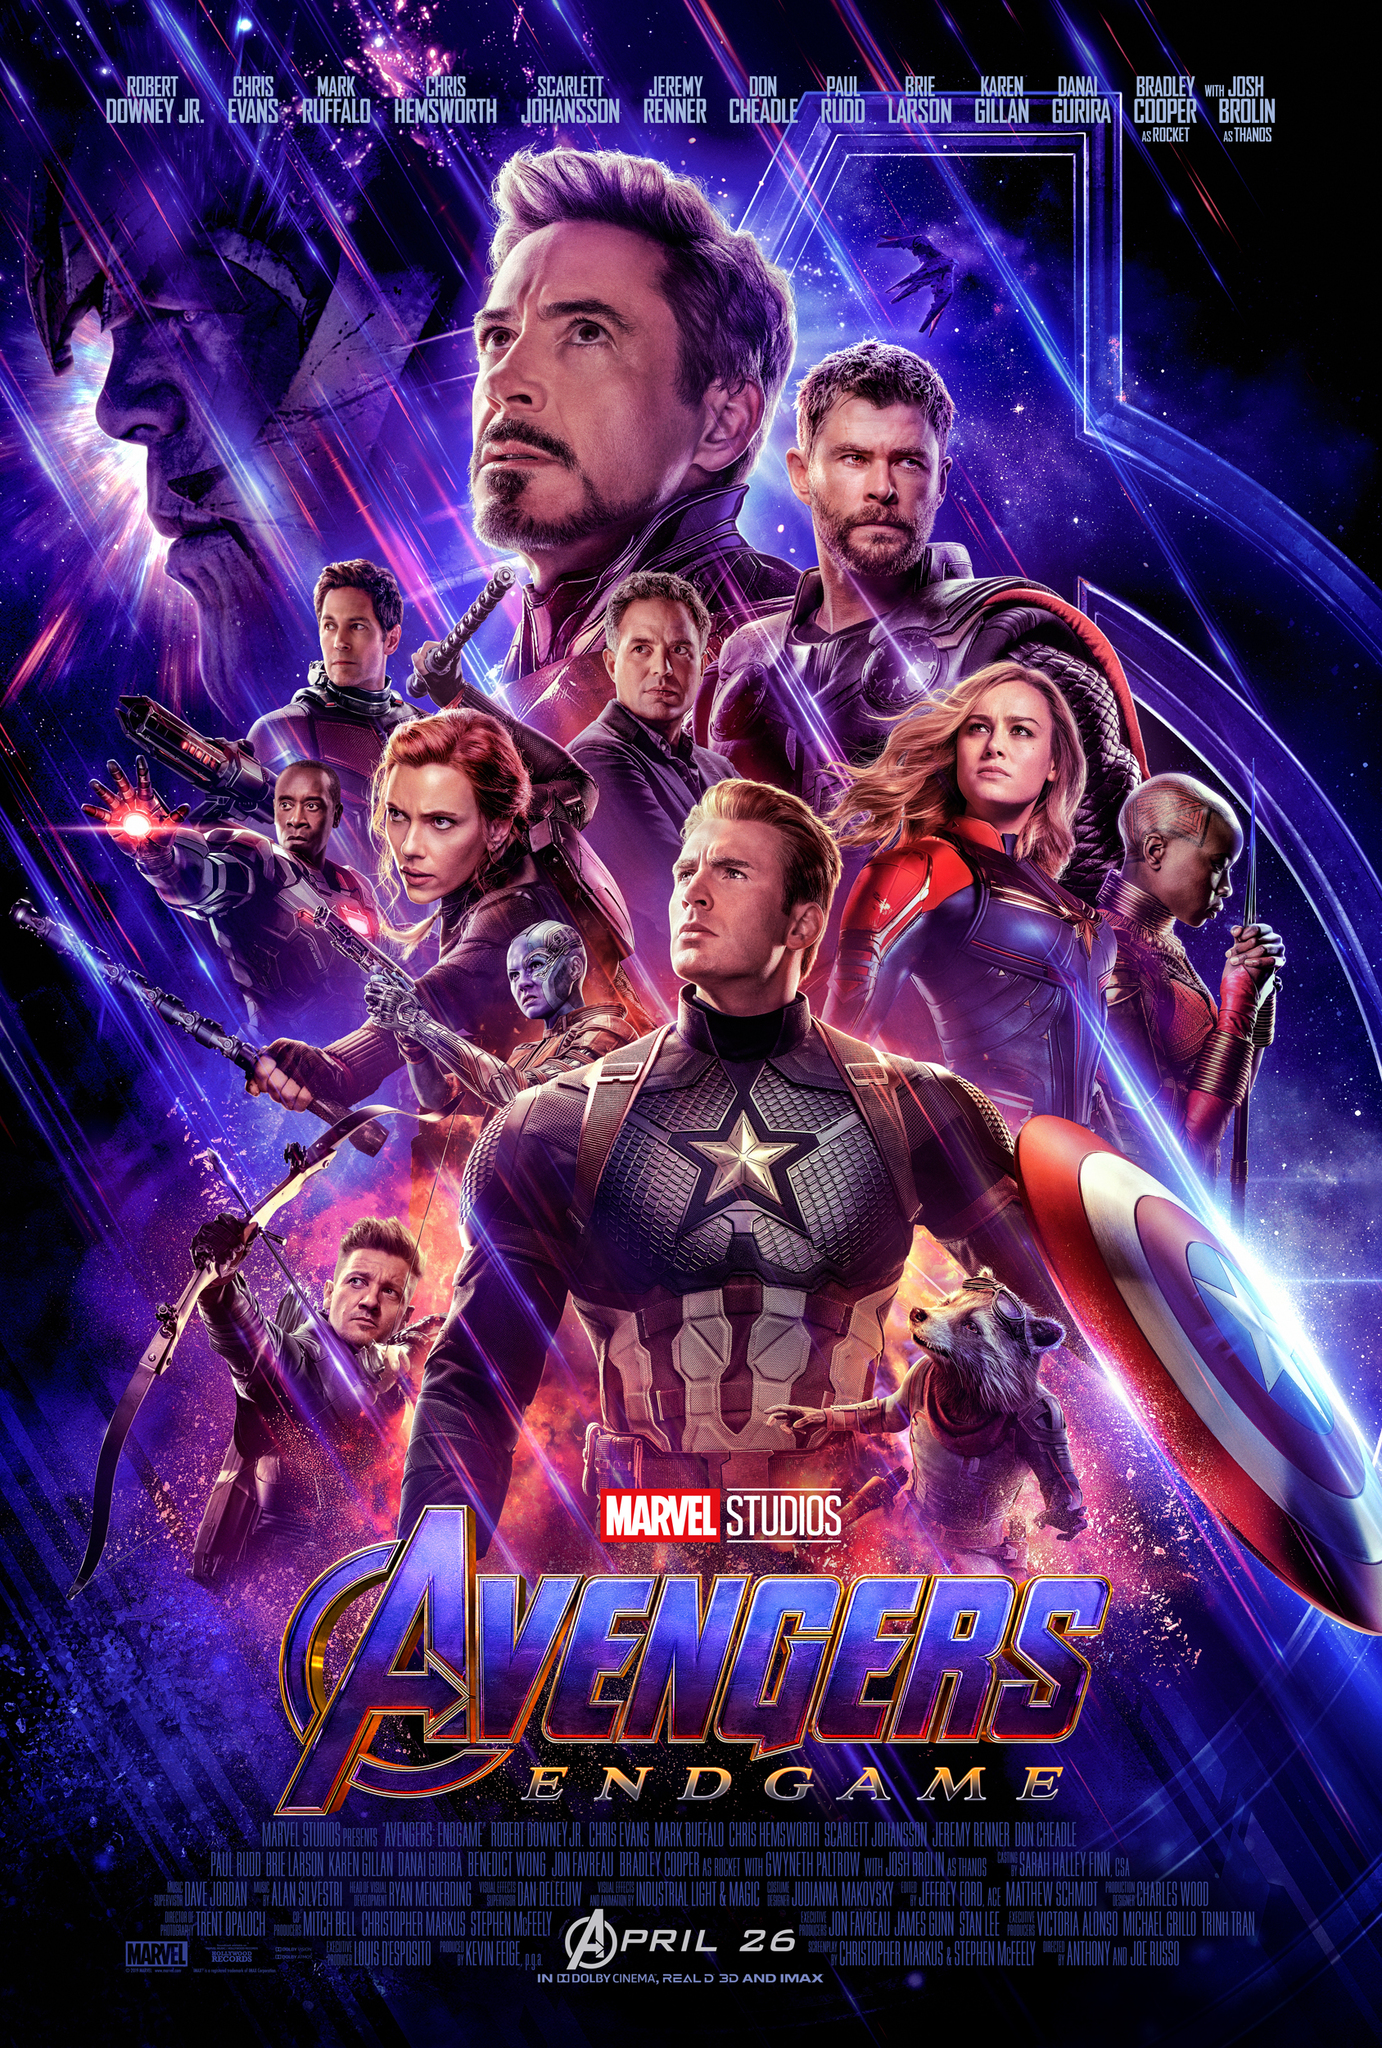 Avengers: Endgame (2019) BluRay 480p, 720p, 1080p & 4K-2160p